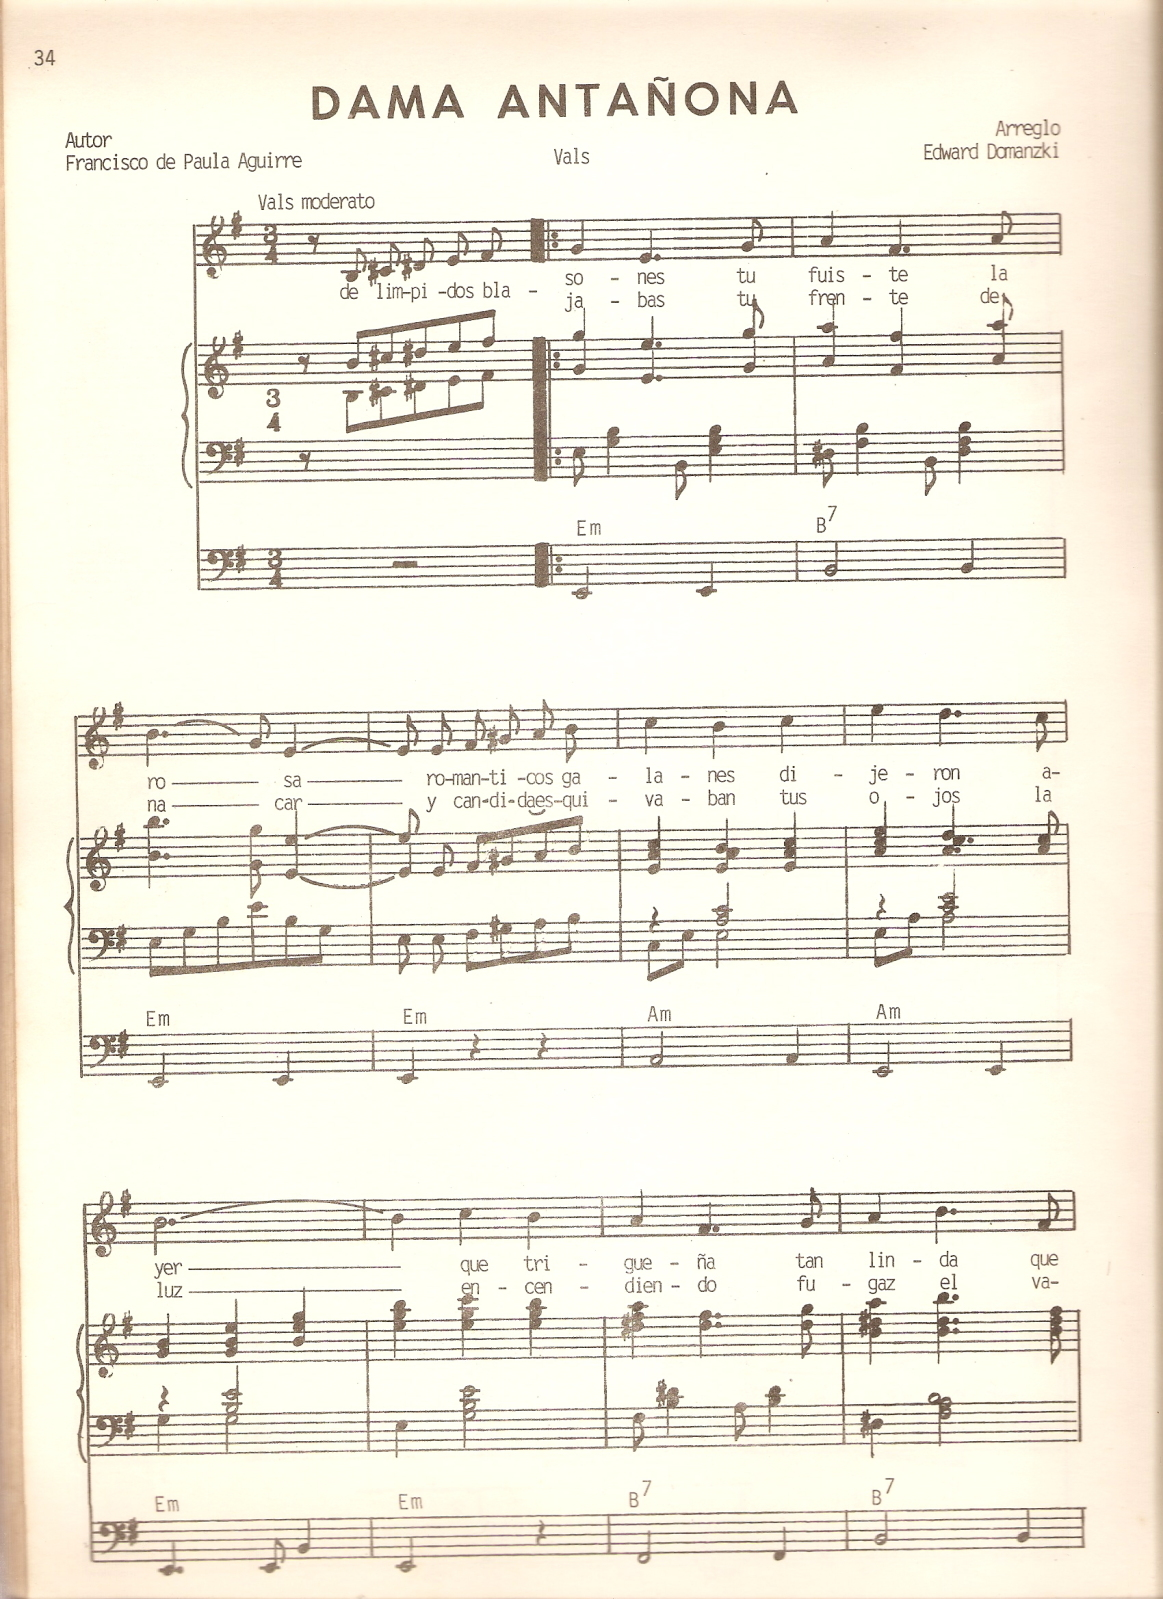 partituras - [Partituras] | Francisco de Paula Aguirre - Dama Antañona 1zo97gh